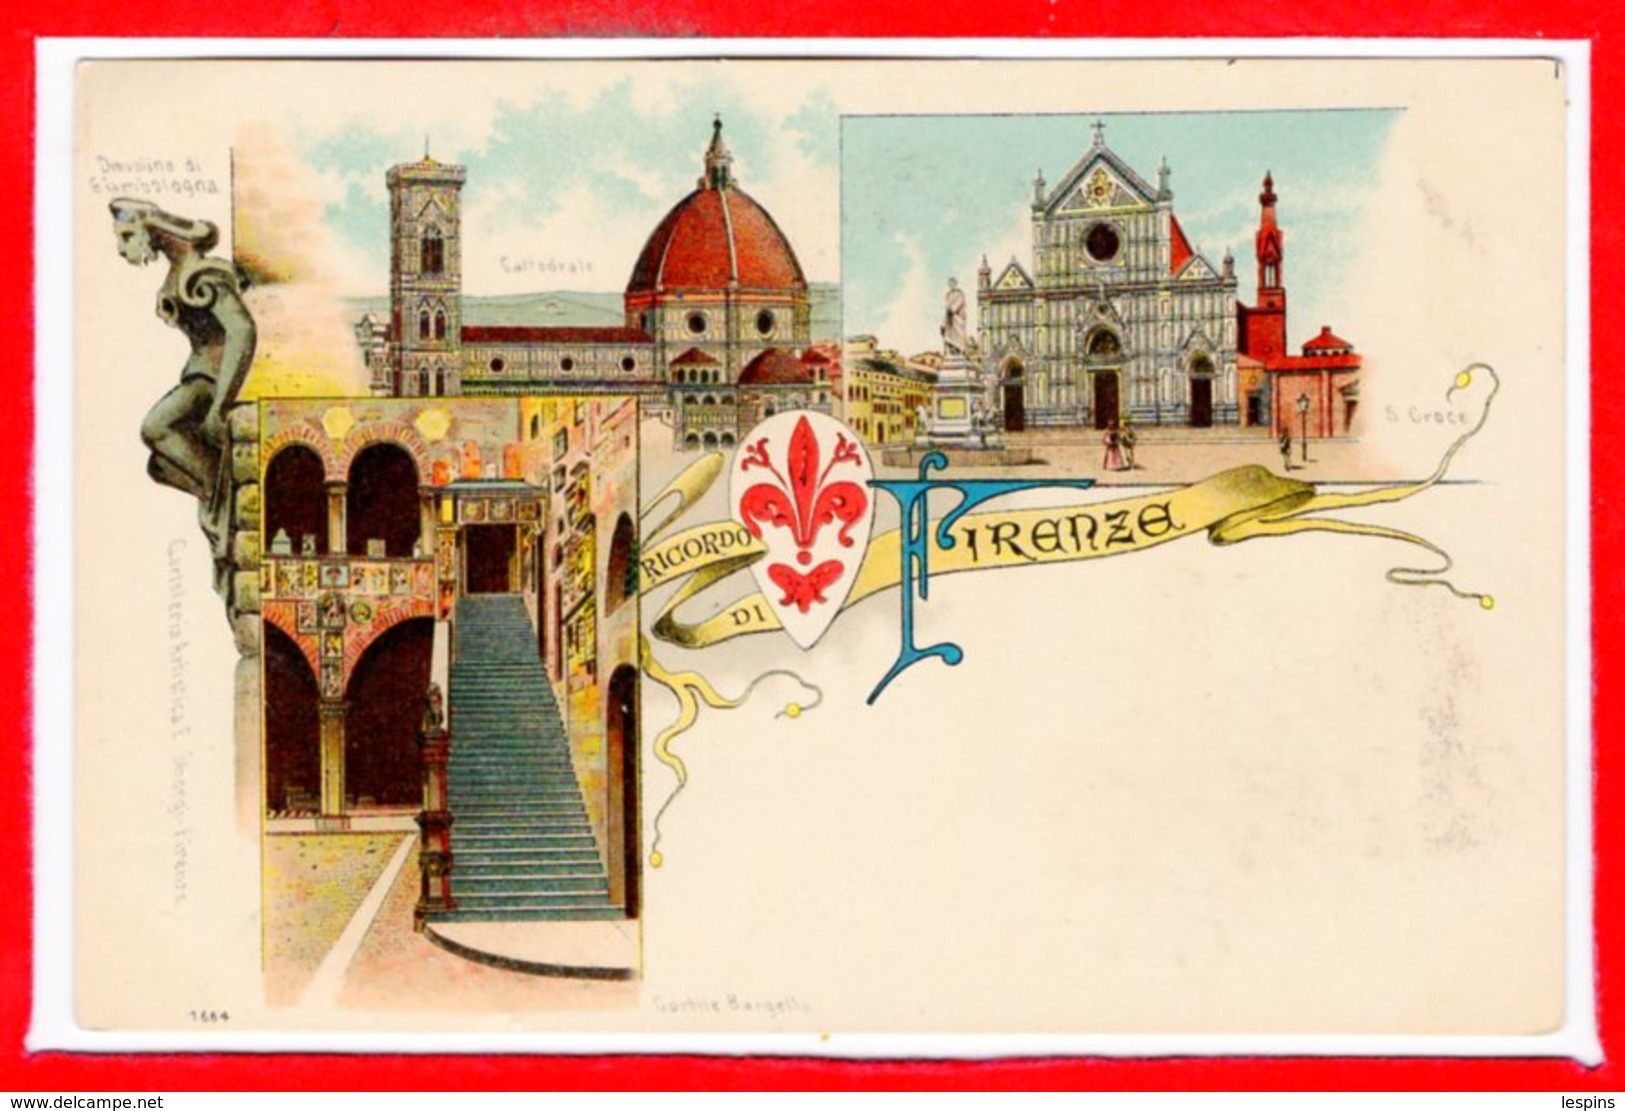 ITALIE - FIRENZE - Ricordo - Etat - Firenze (Florence)